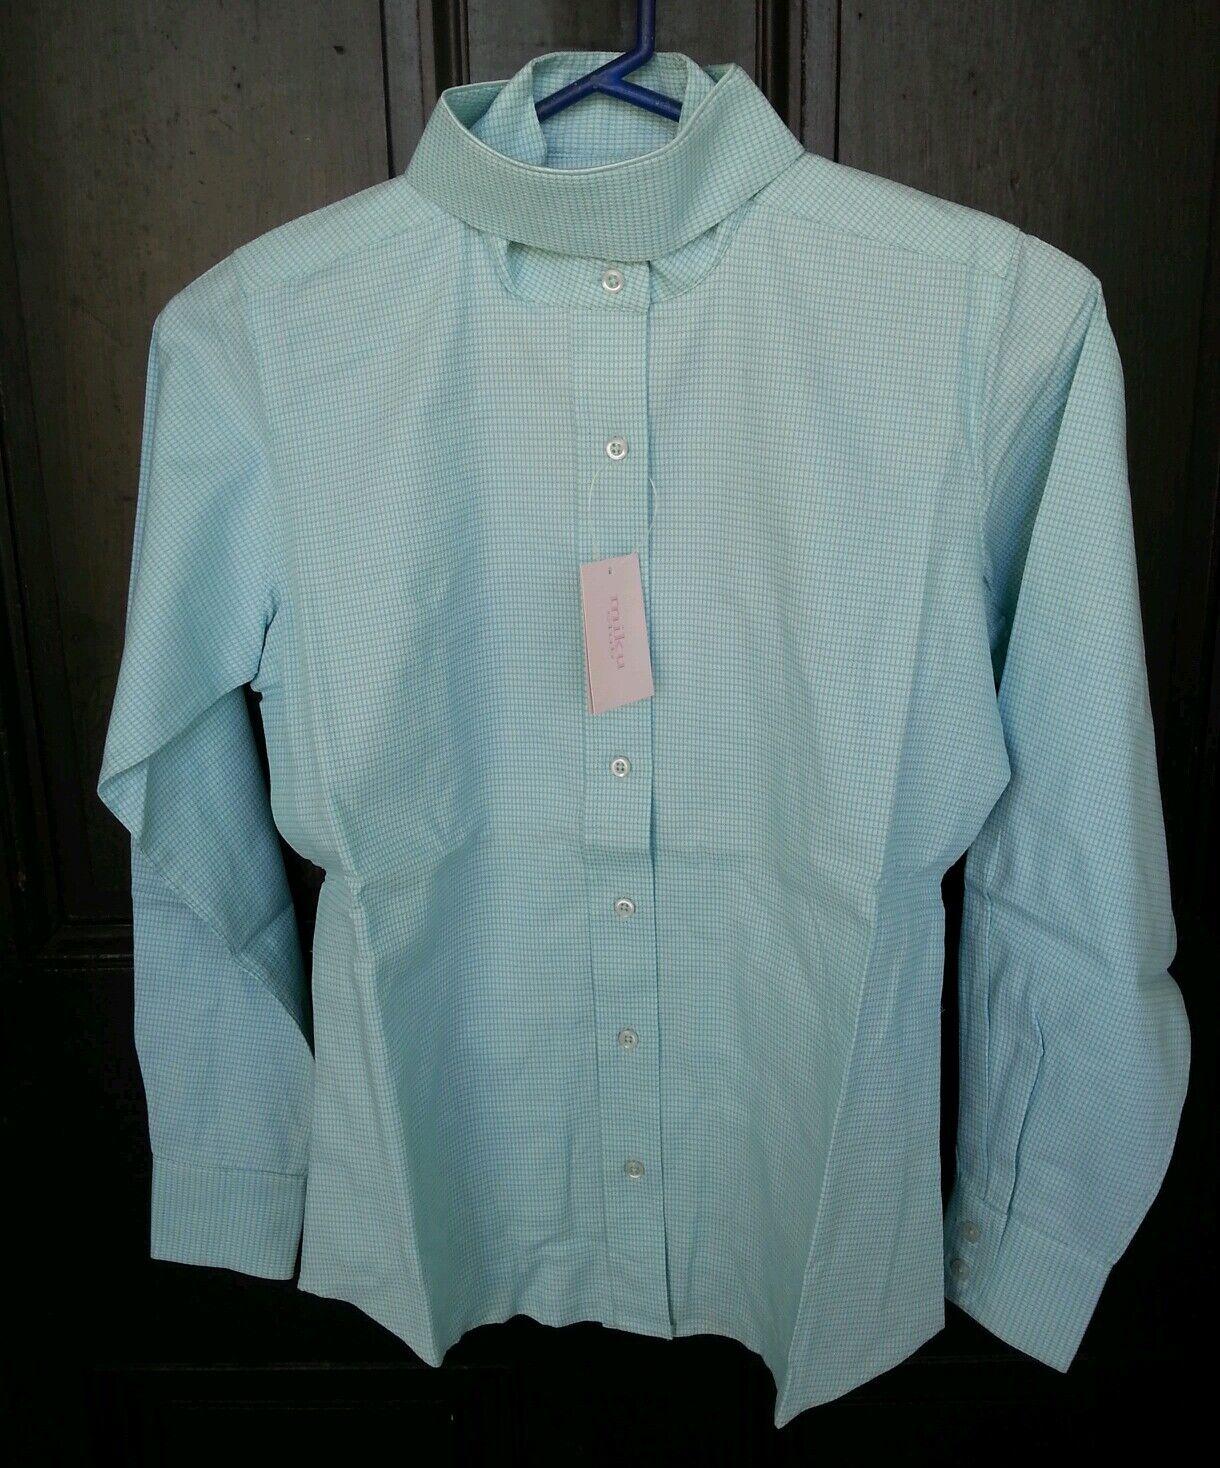 NWT MIKU CLUB Girls Green & White Cotton Long Sleeve Ratcatcher Horse Show Shirt